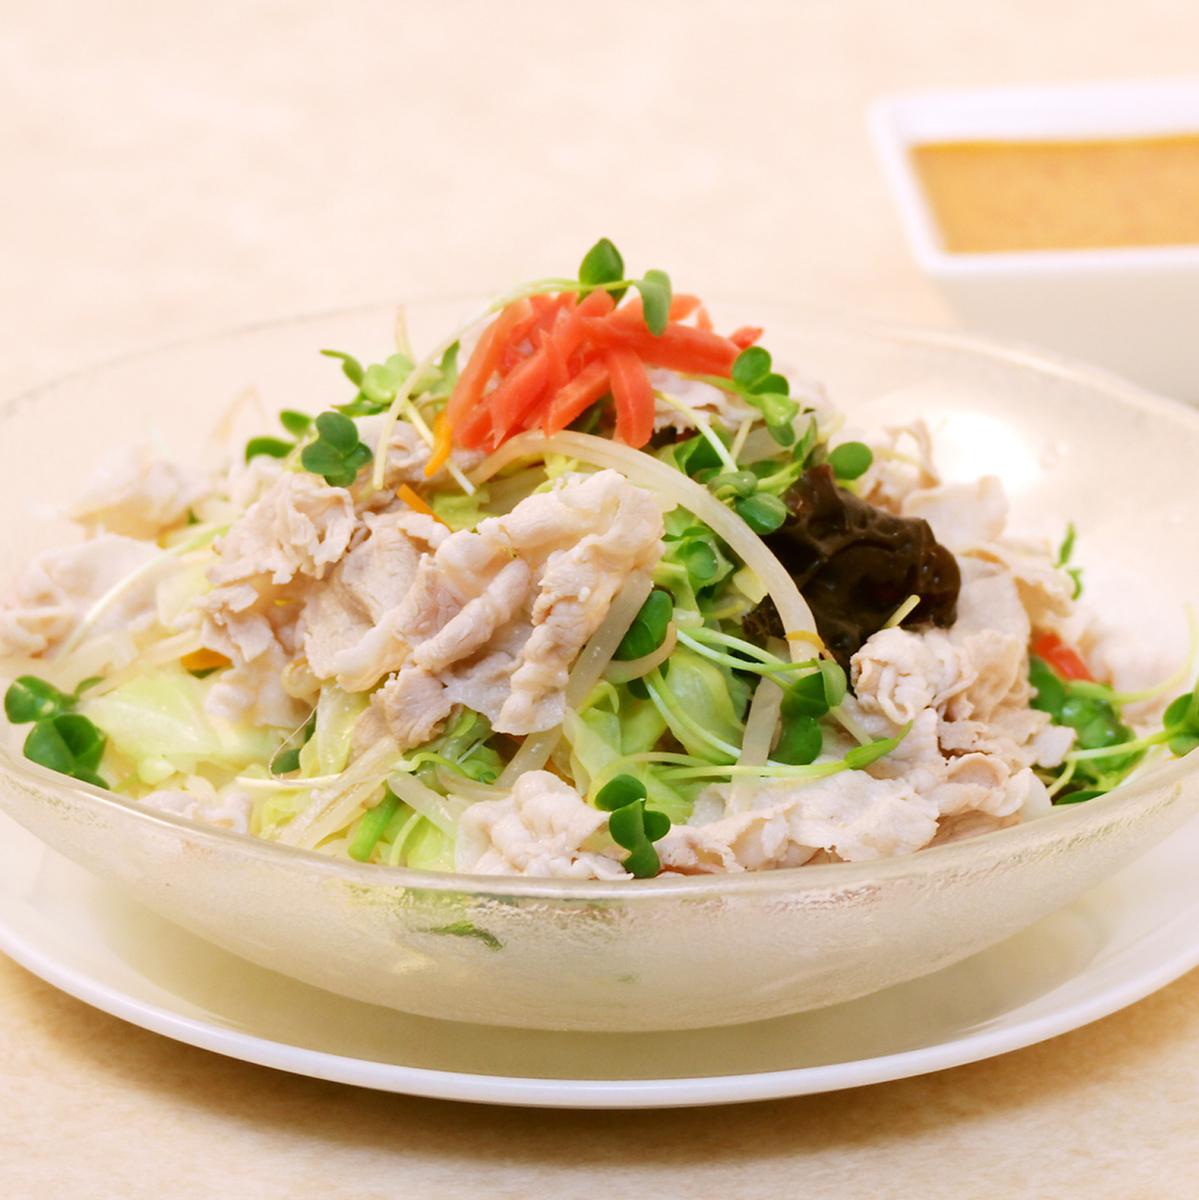 Pork shabu-shu cold noodles